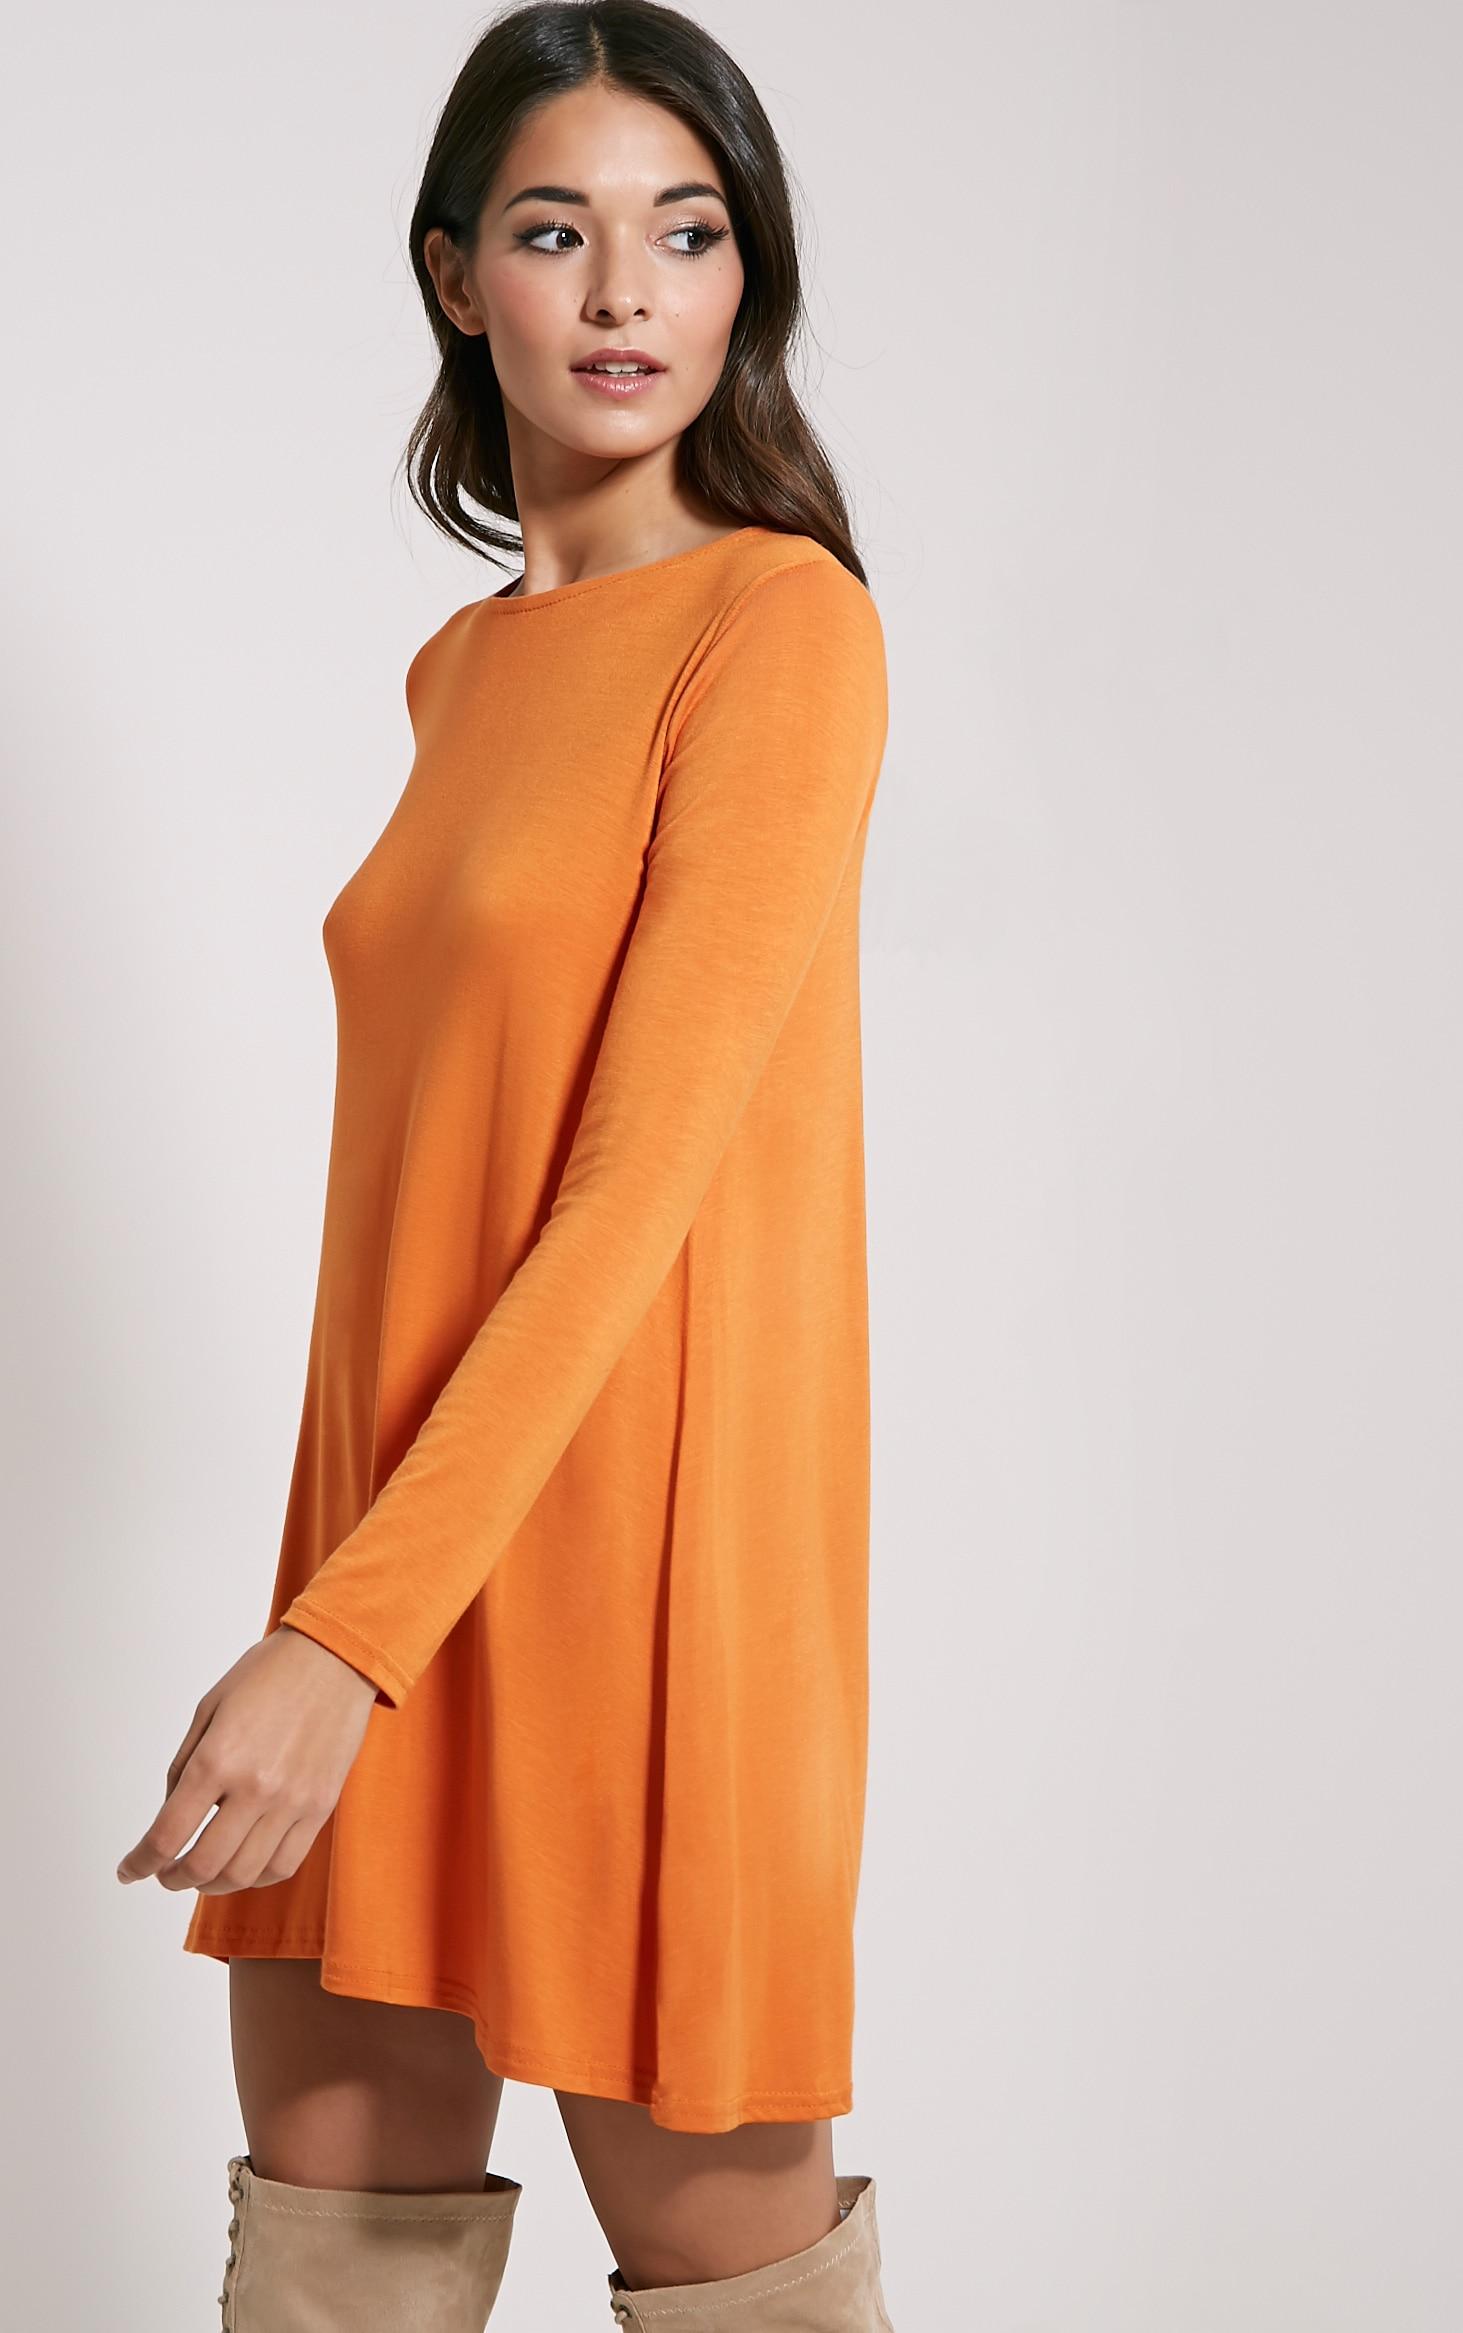 Basic Burnt Orange Long Sleeve Swing Dress 3